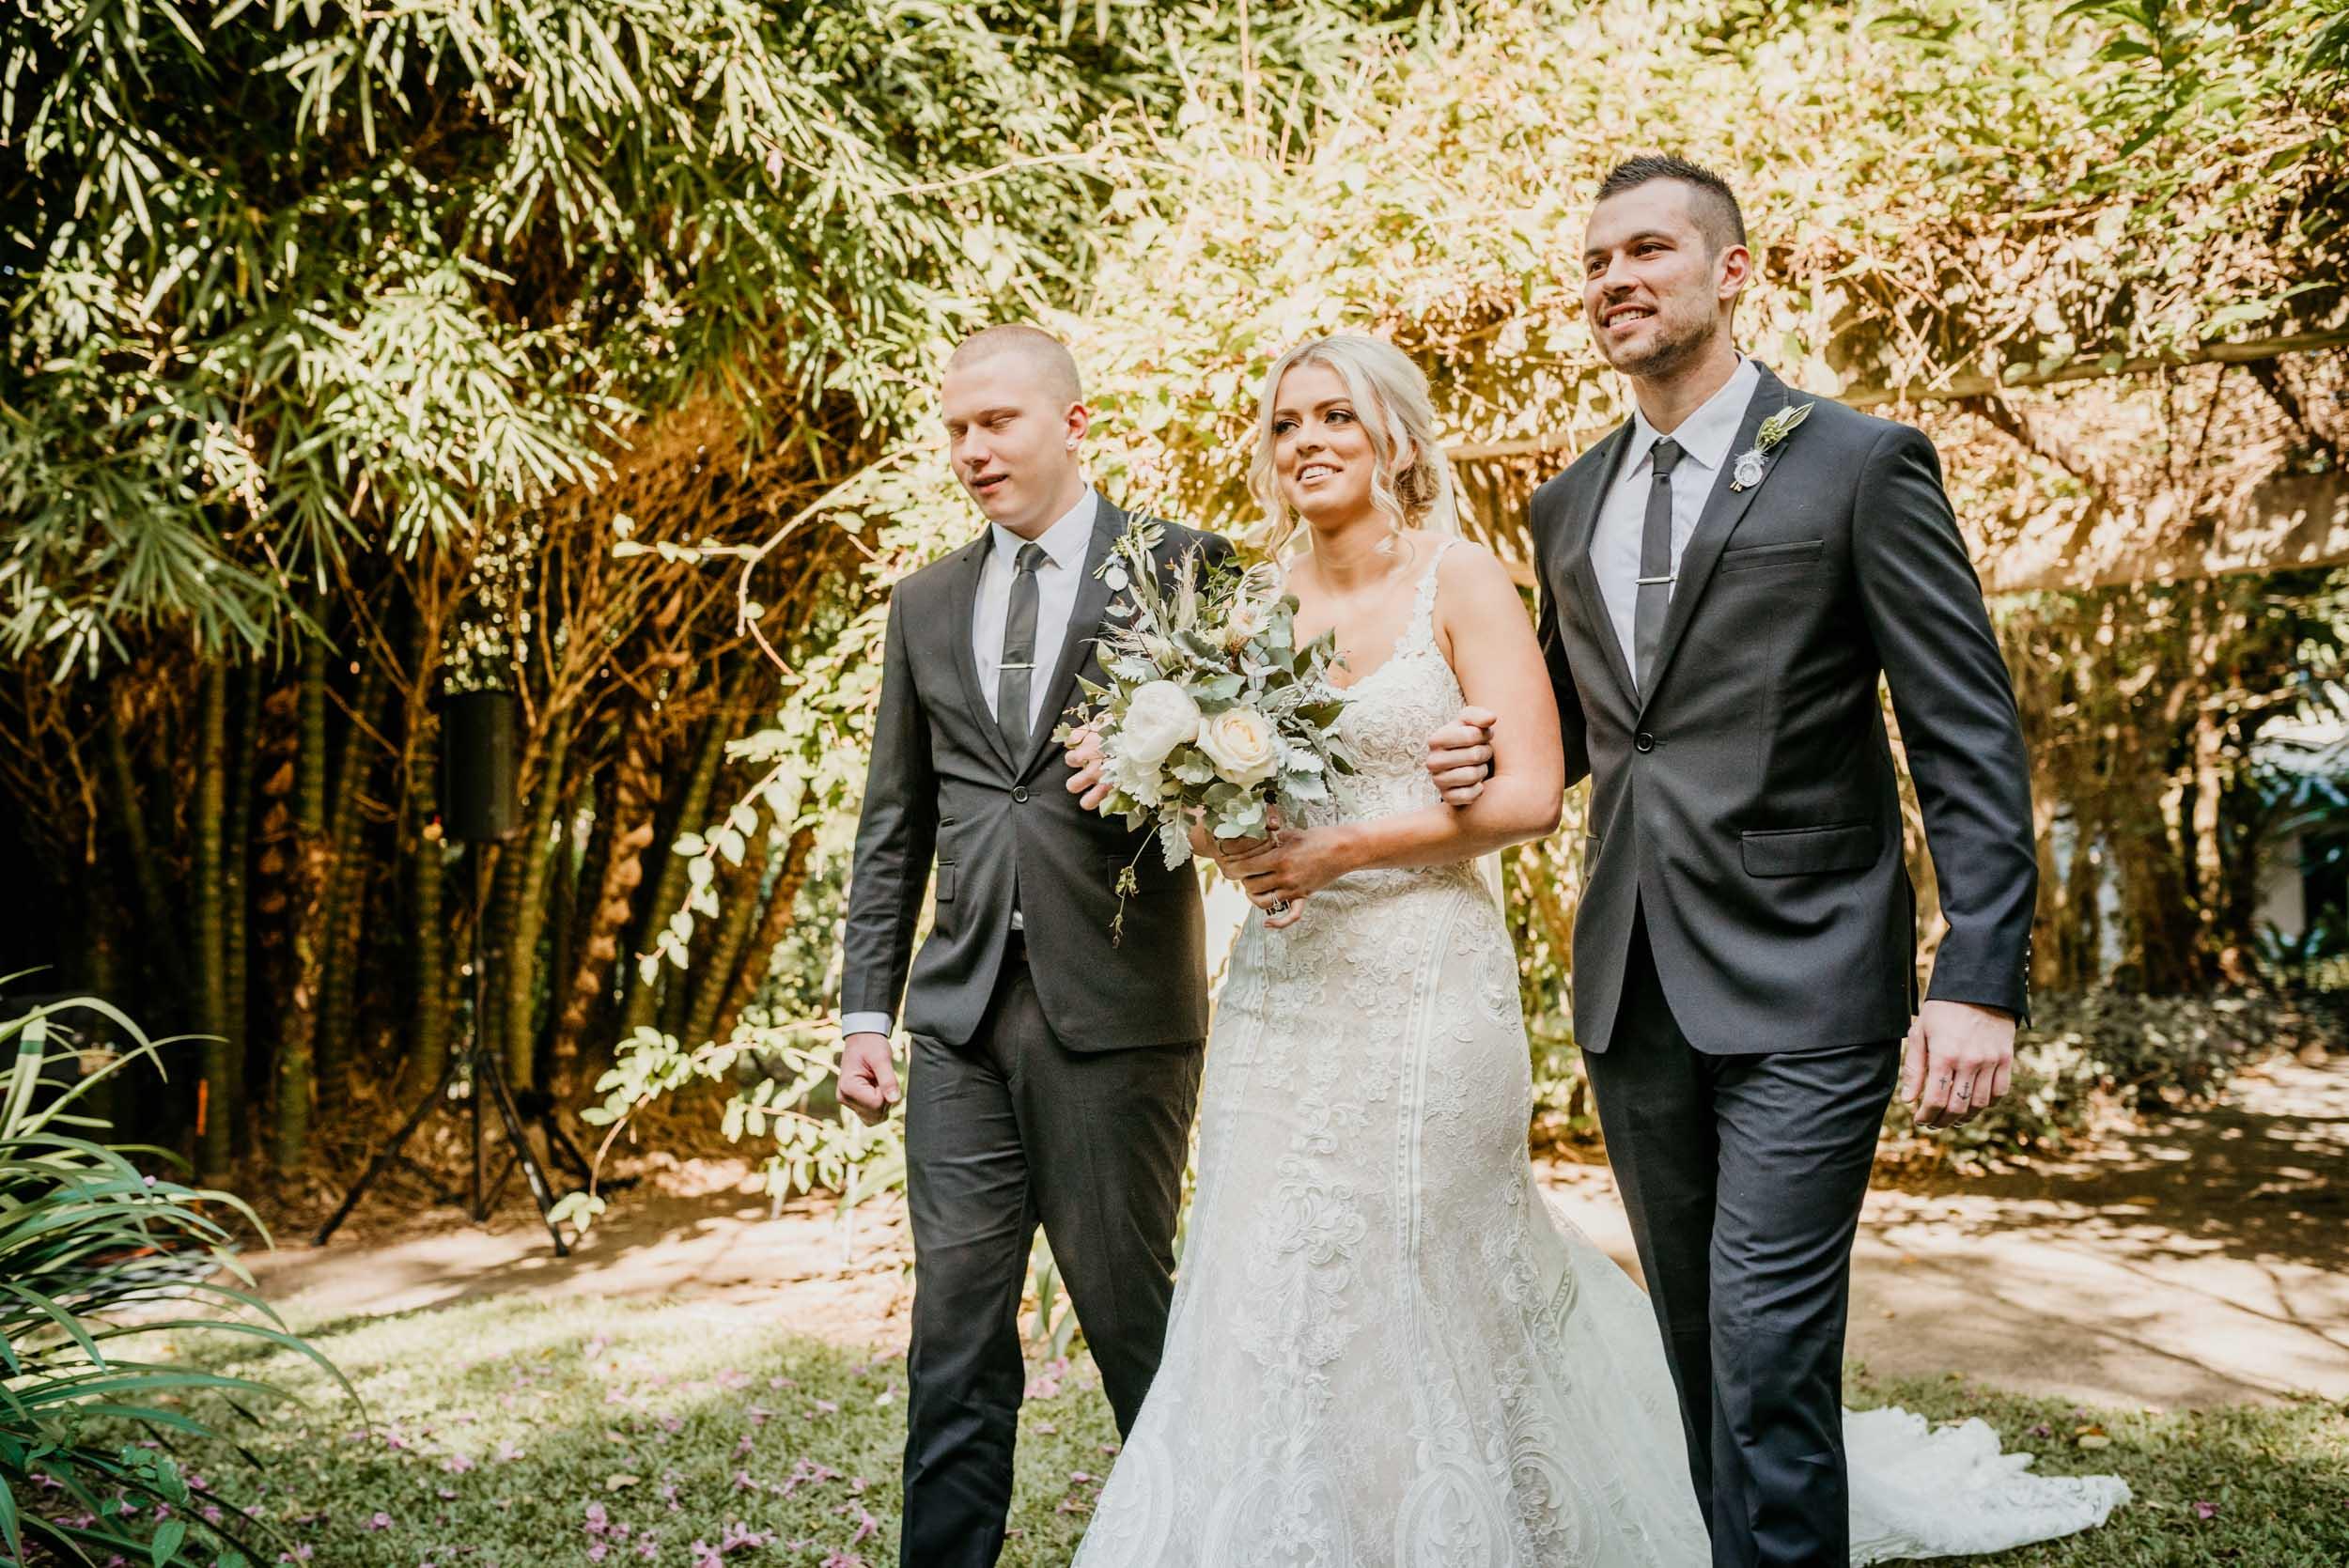 The Raw Photographer - Cairns Wedding Photographer - Laloli - Cairns Garden Wedding - Bride Dress - Destination Wed - Outdoor Reception - Queensland Ceremony-27.jpg